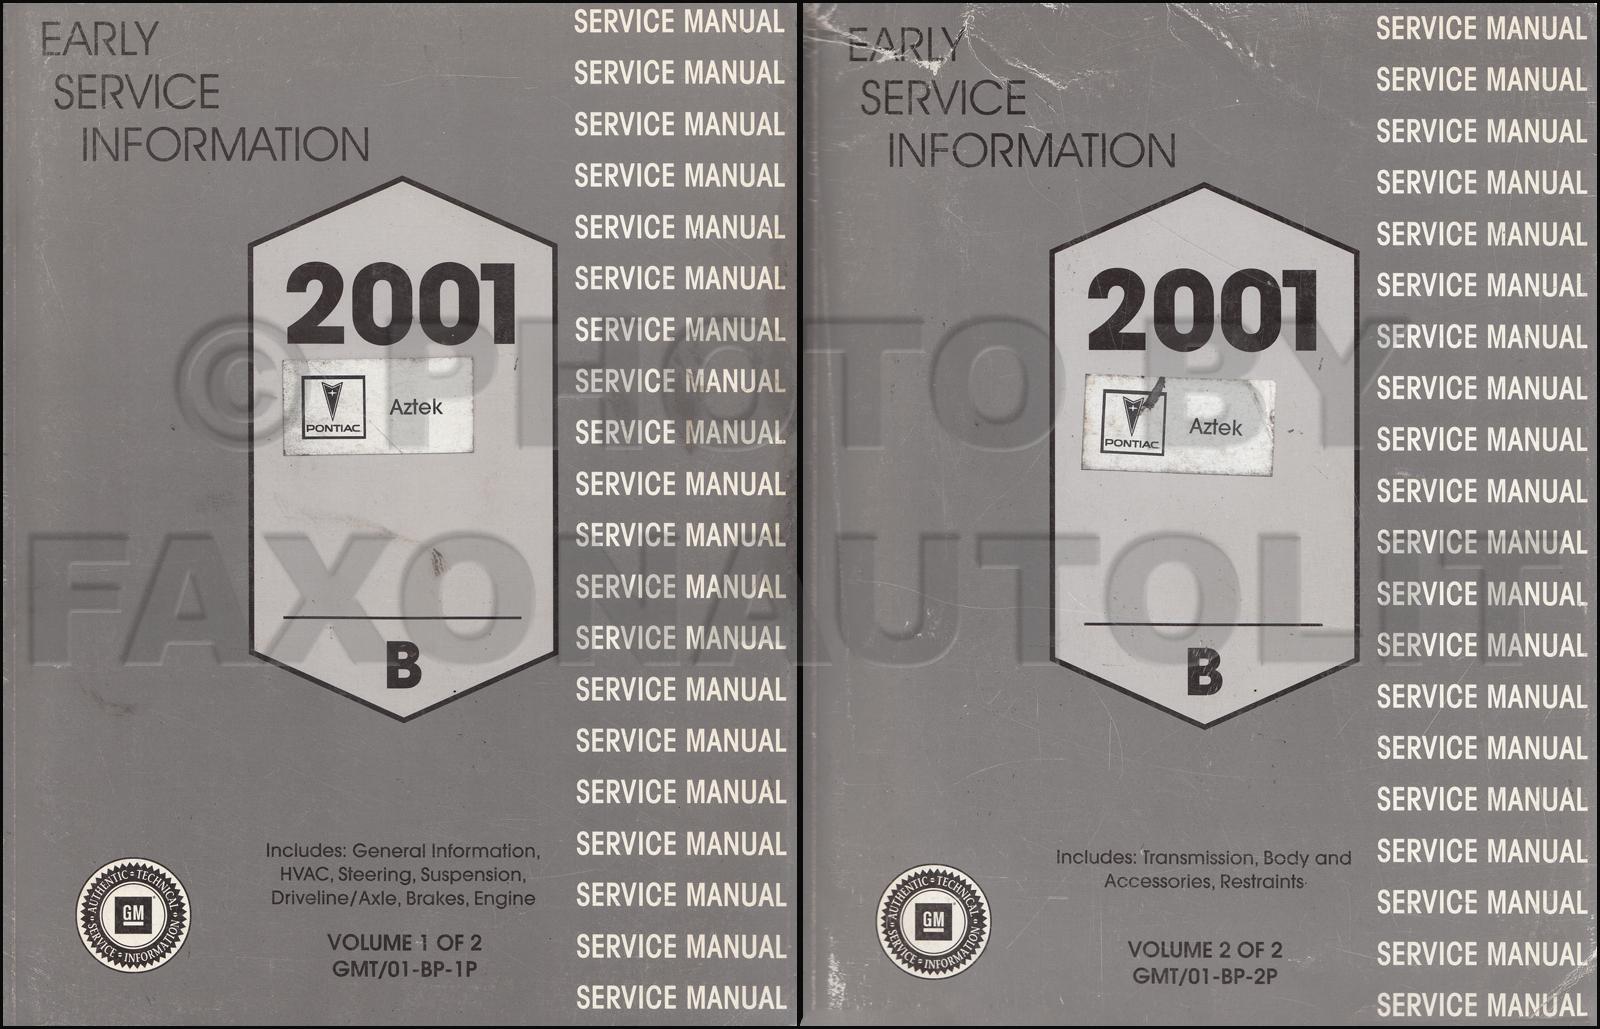 2001 pontiac aztek preliminary repair shop manual original. Black Bedroom Furniture Sets. Home Design Ideas